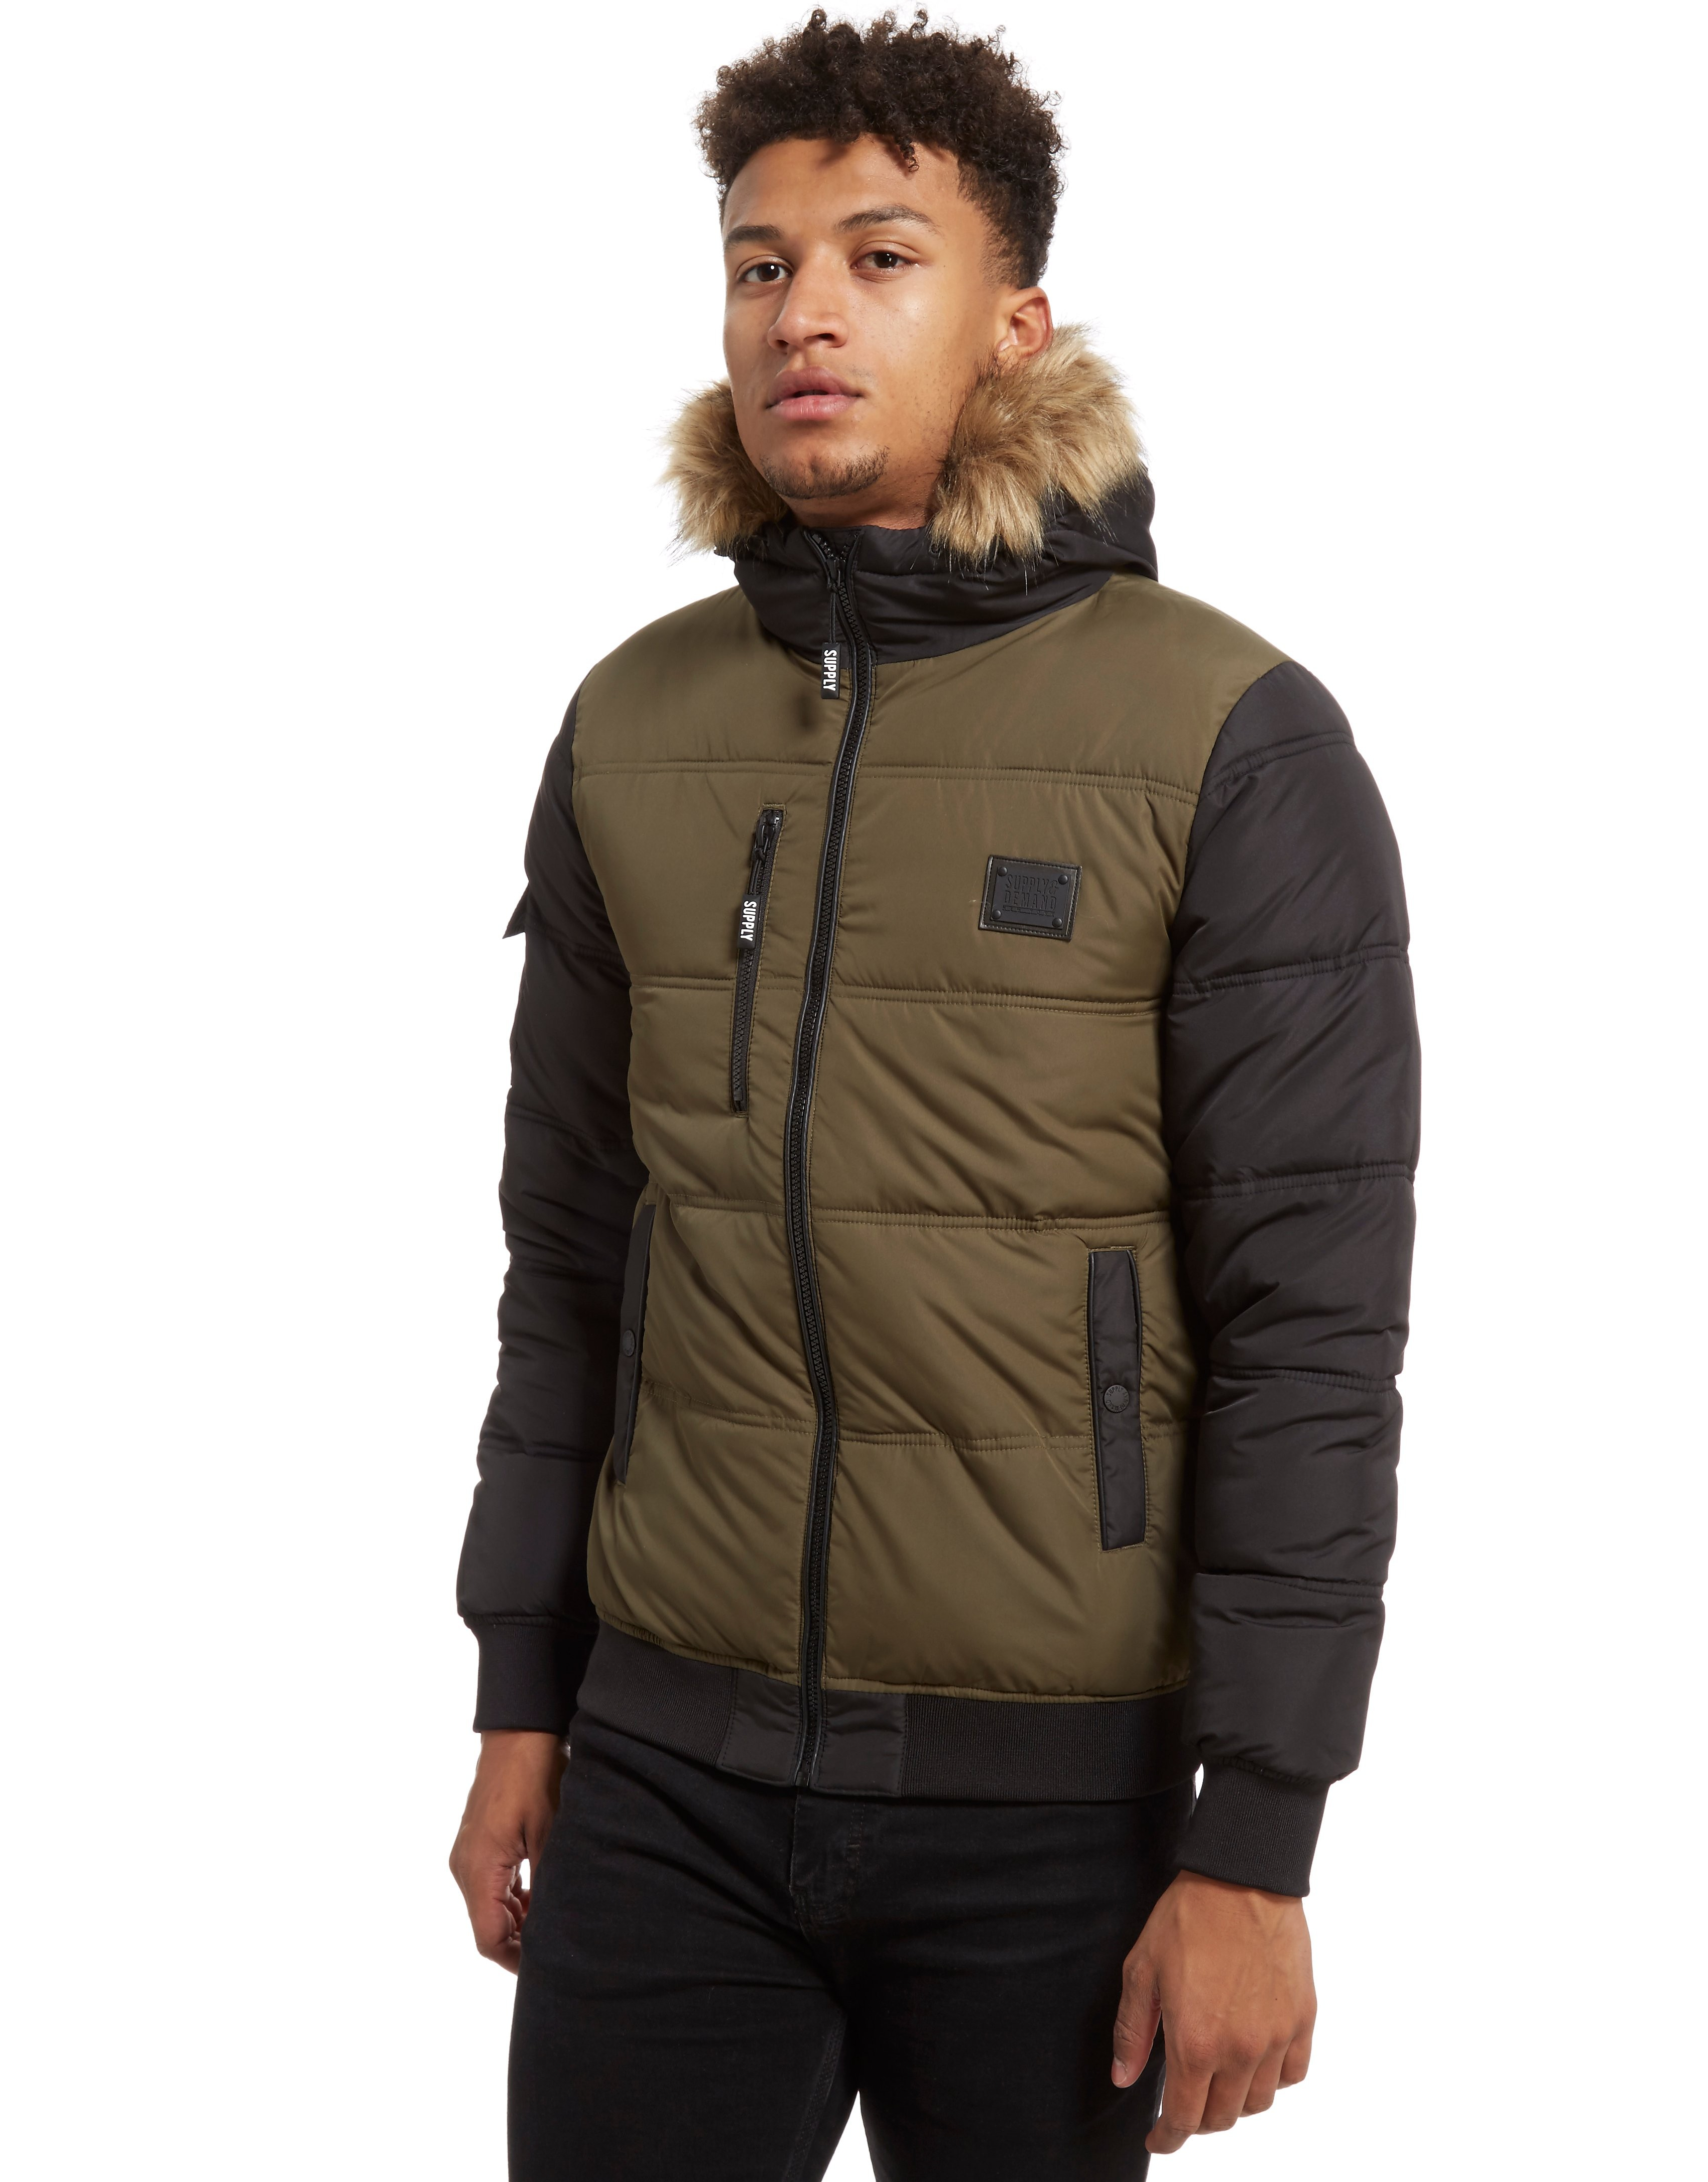 Supply & Demand Splinter Jacket